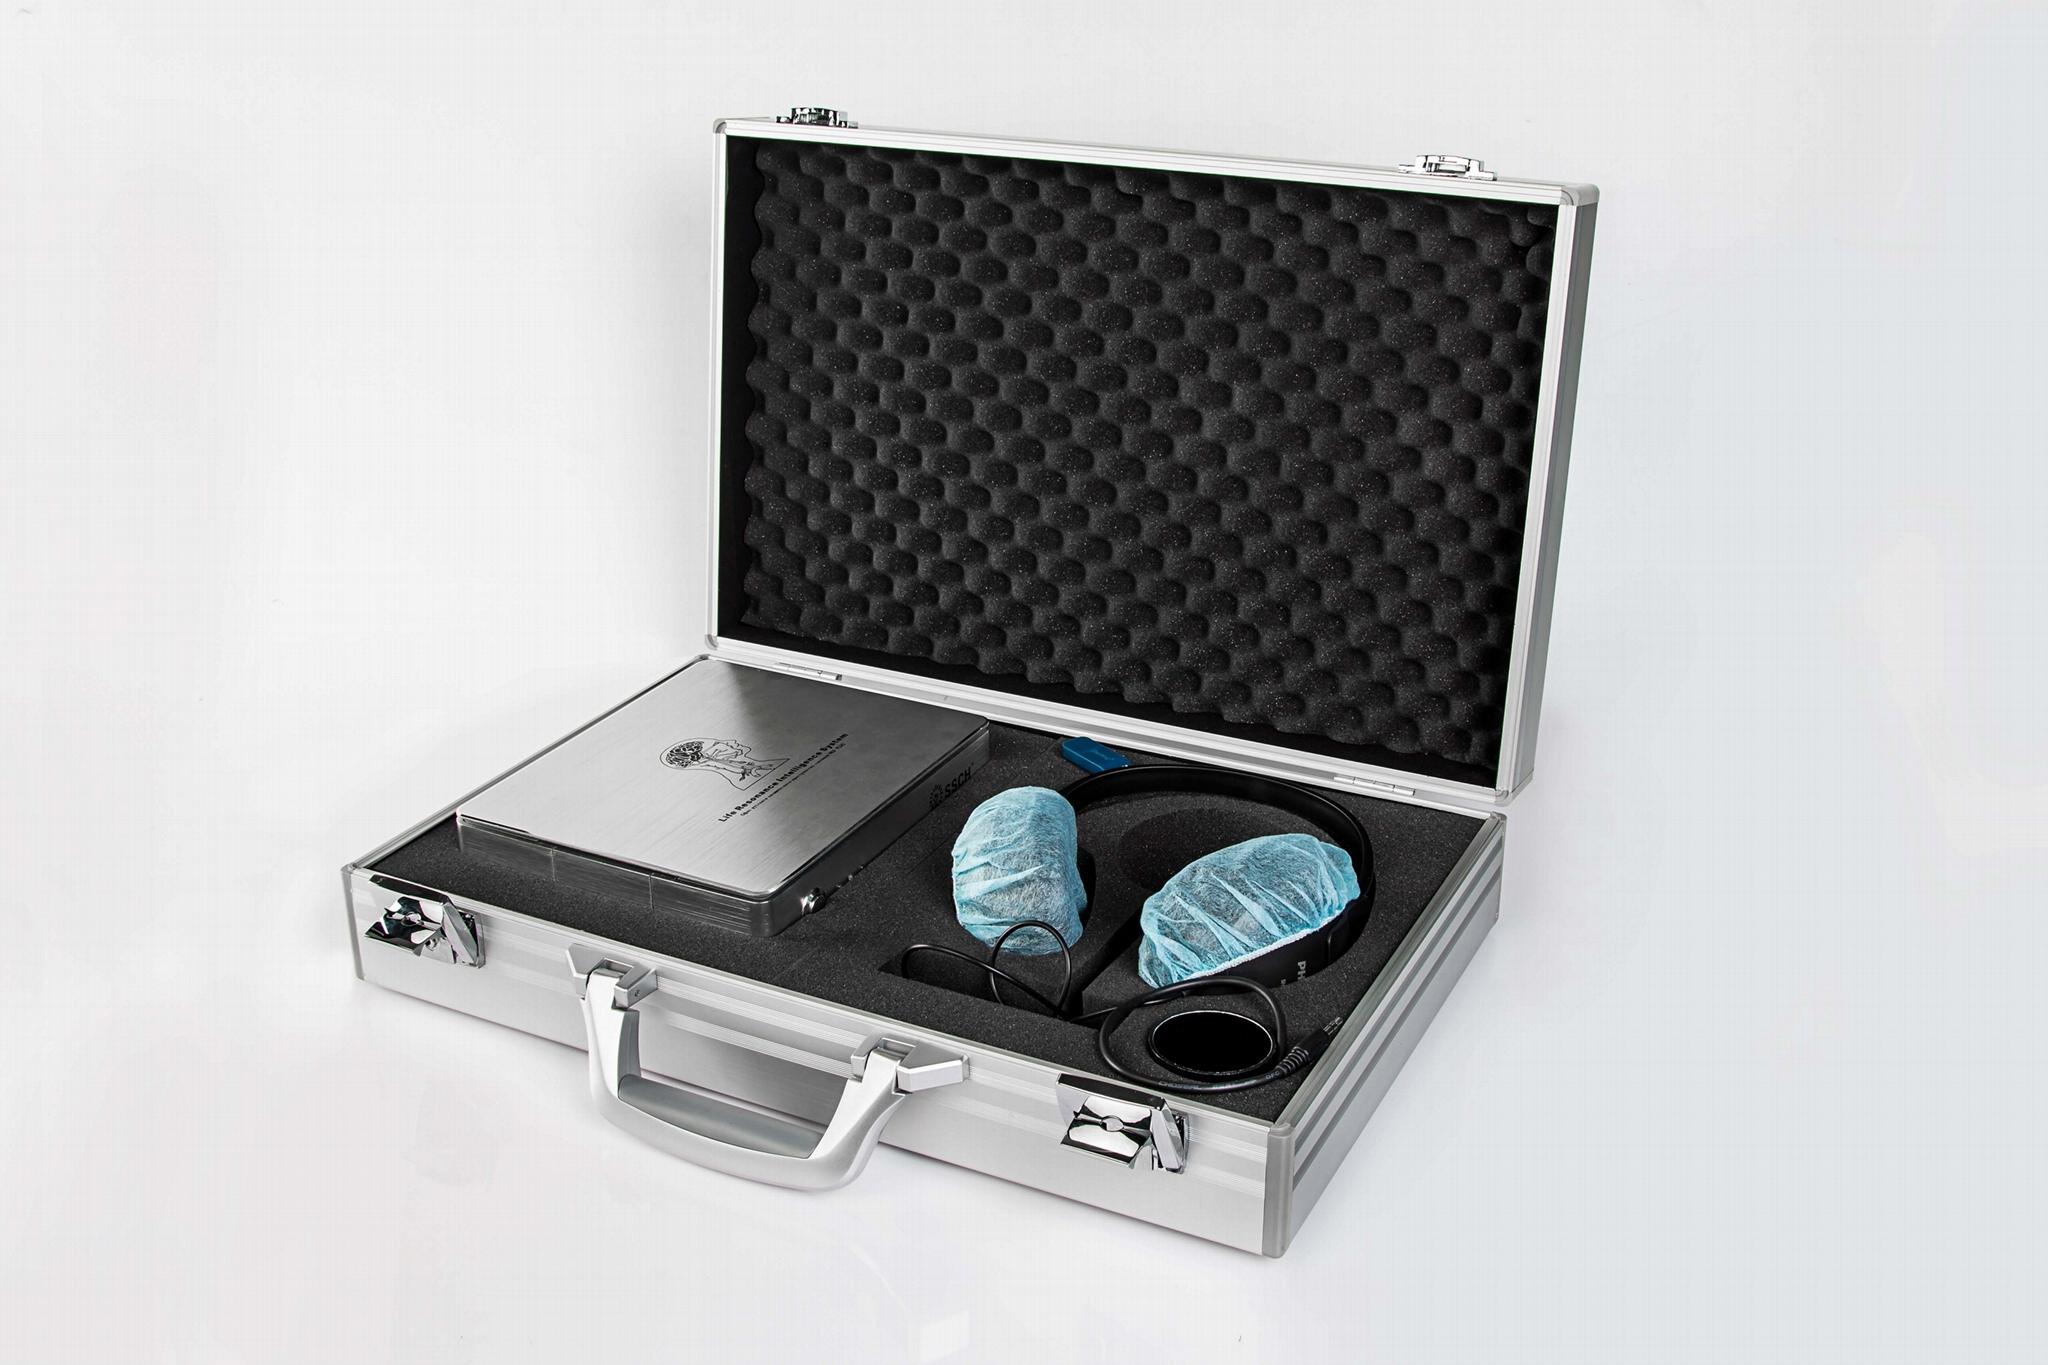 Nuclear Magnetic Resonance Metatron Nls 4025 Hunter Upgraded Version 1